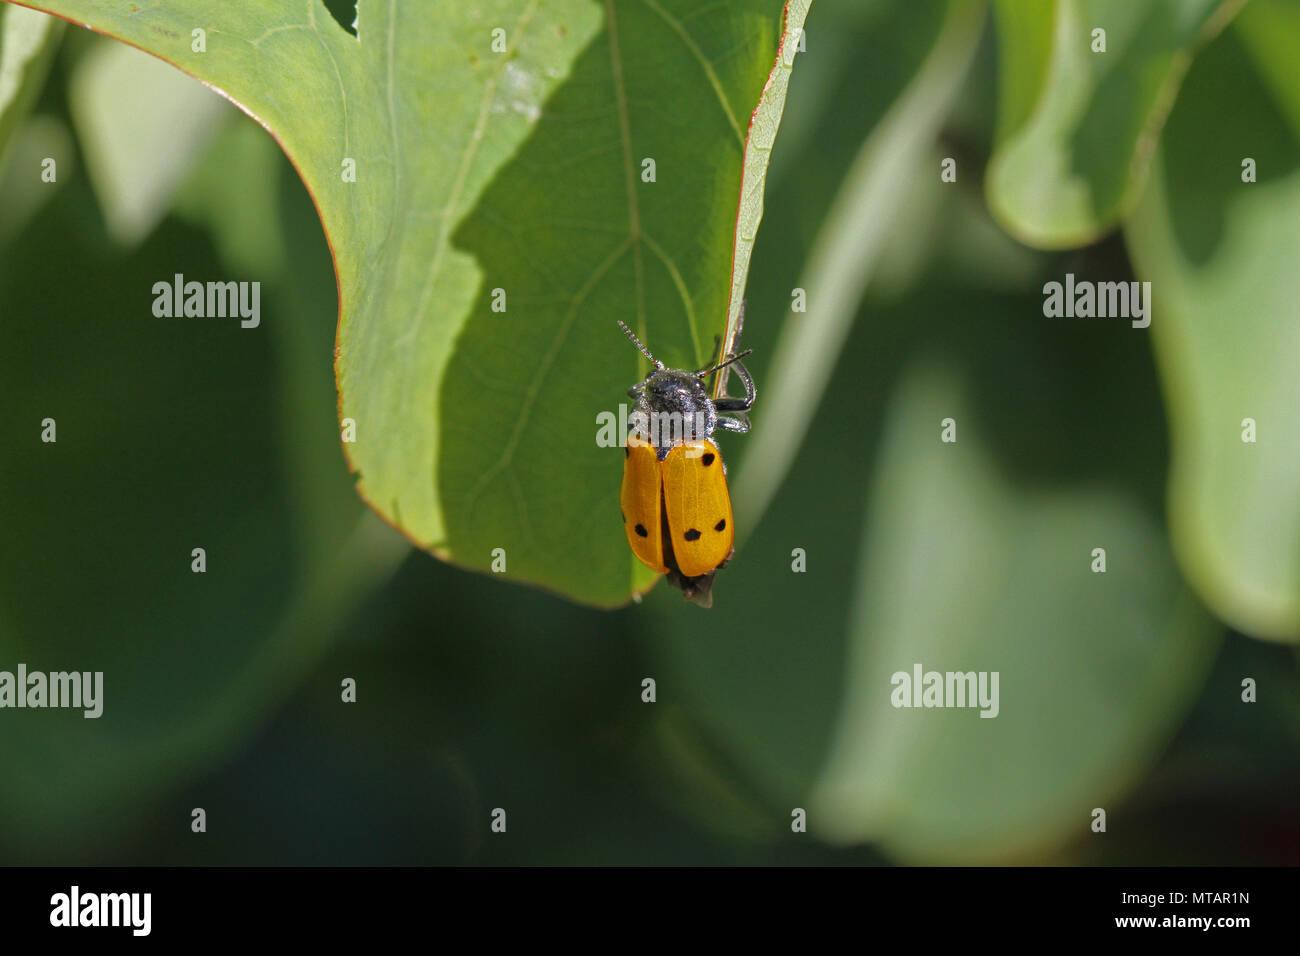 four spotted leaf beetle or poplar variant with six spots Latin clytra quadripunctata or chrysomela populi feeding on a judas tree leaf in Italy - Stock Image